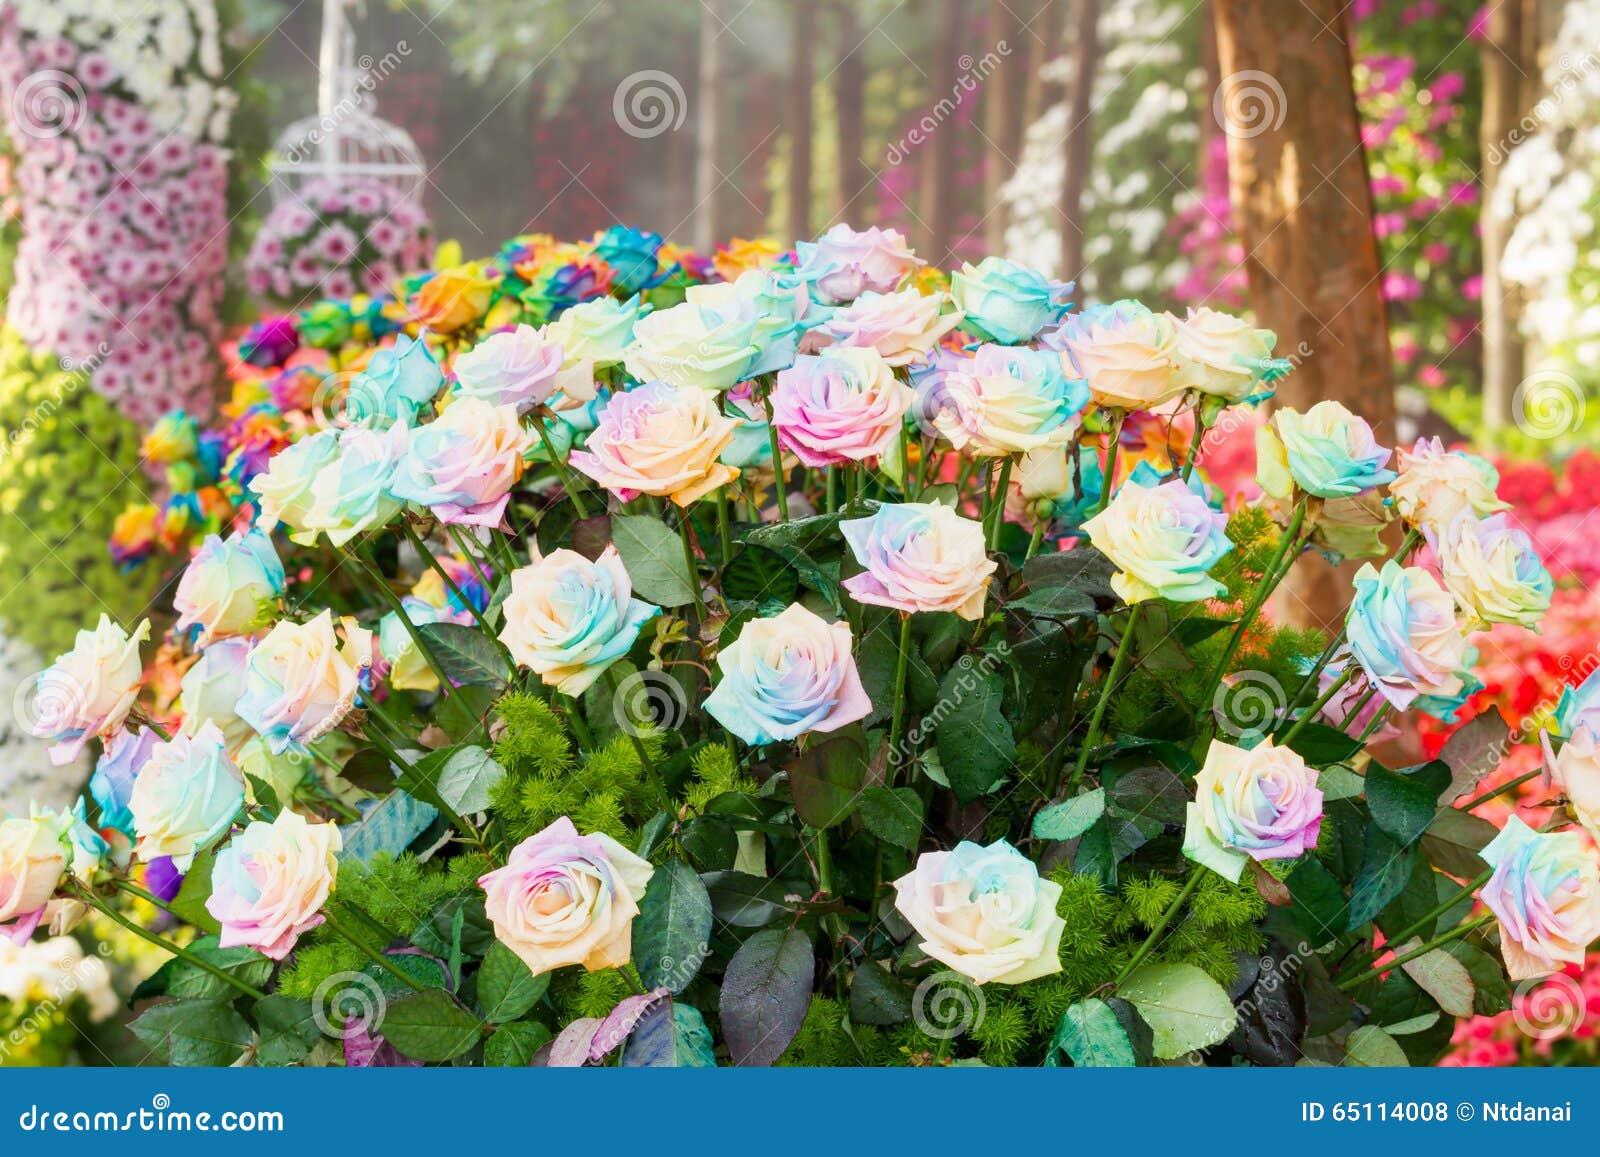 Rainbow Roses Stock Photo - Image: 65114008